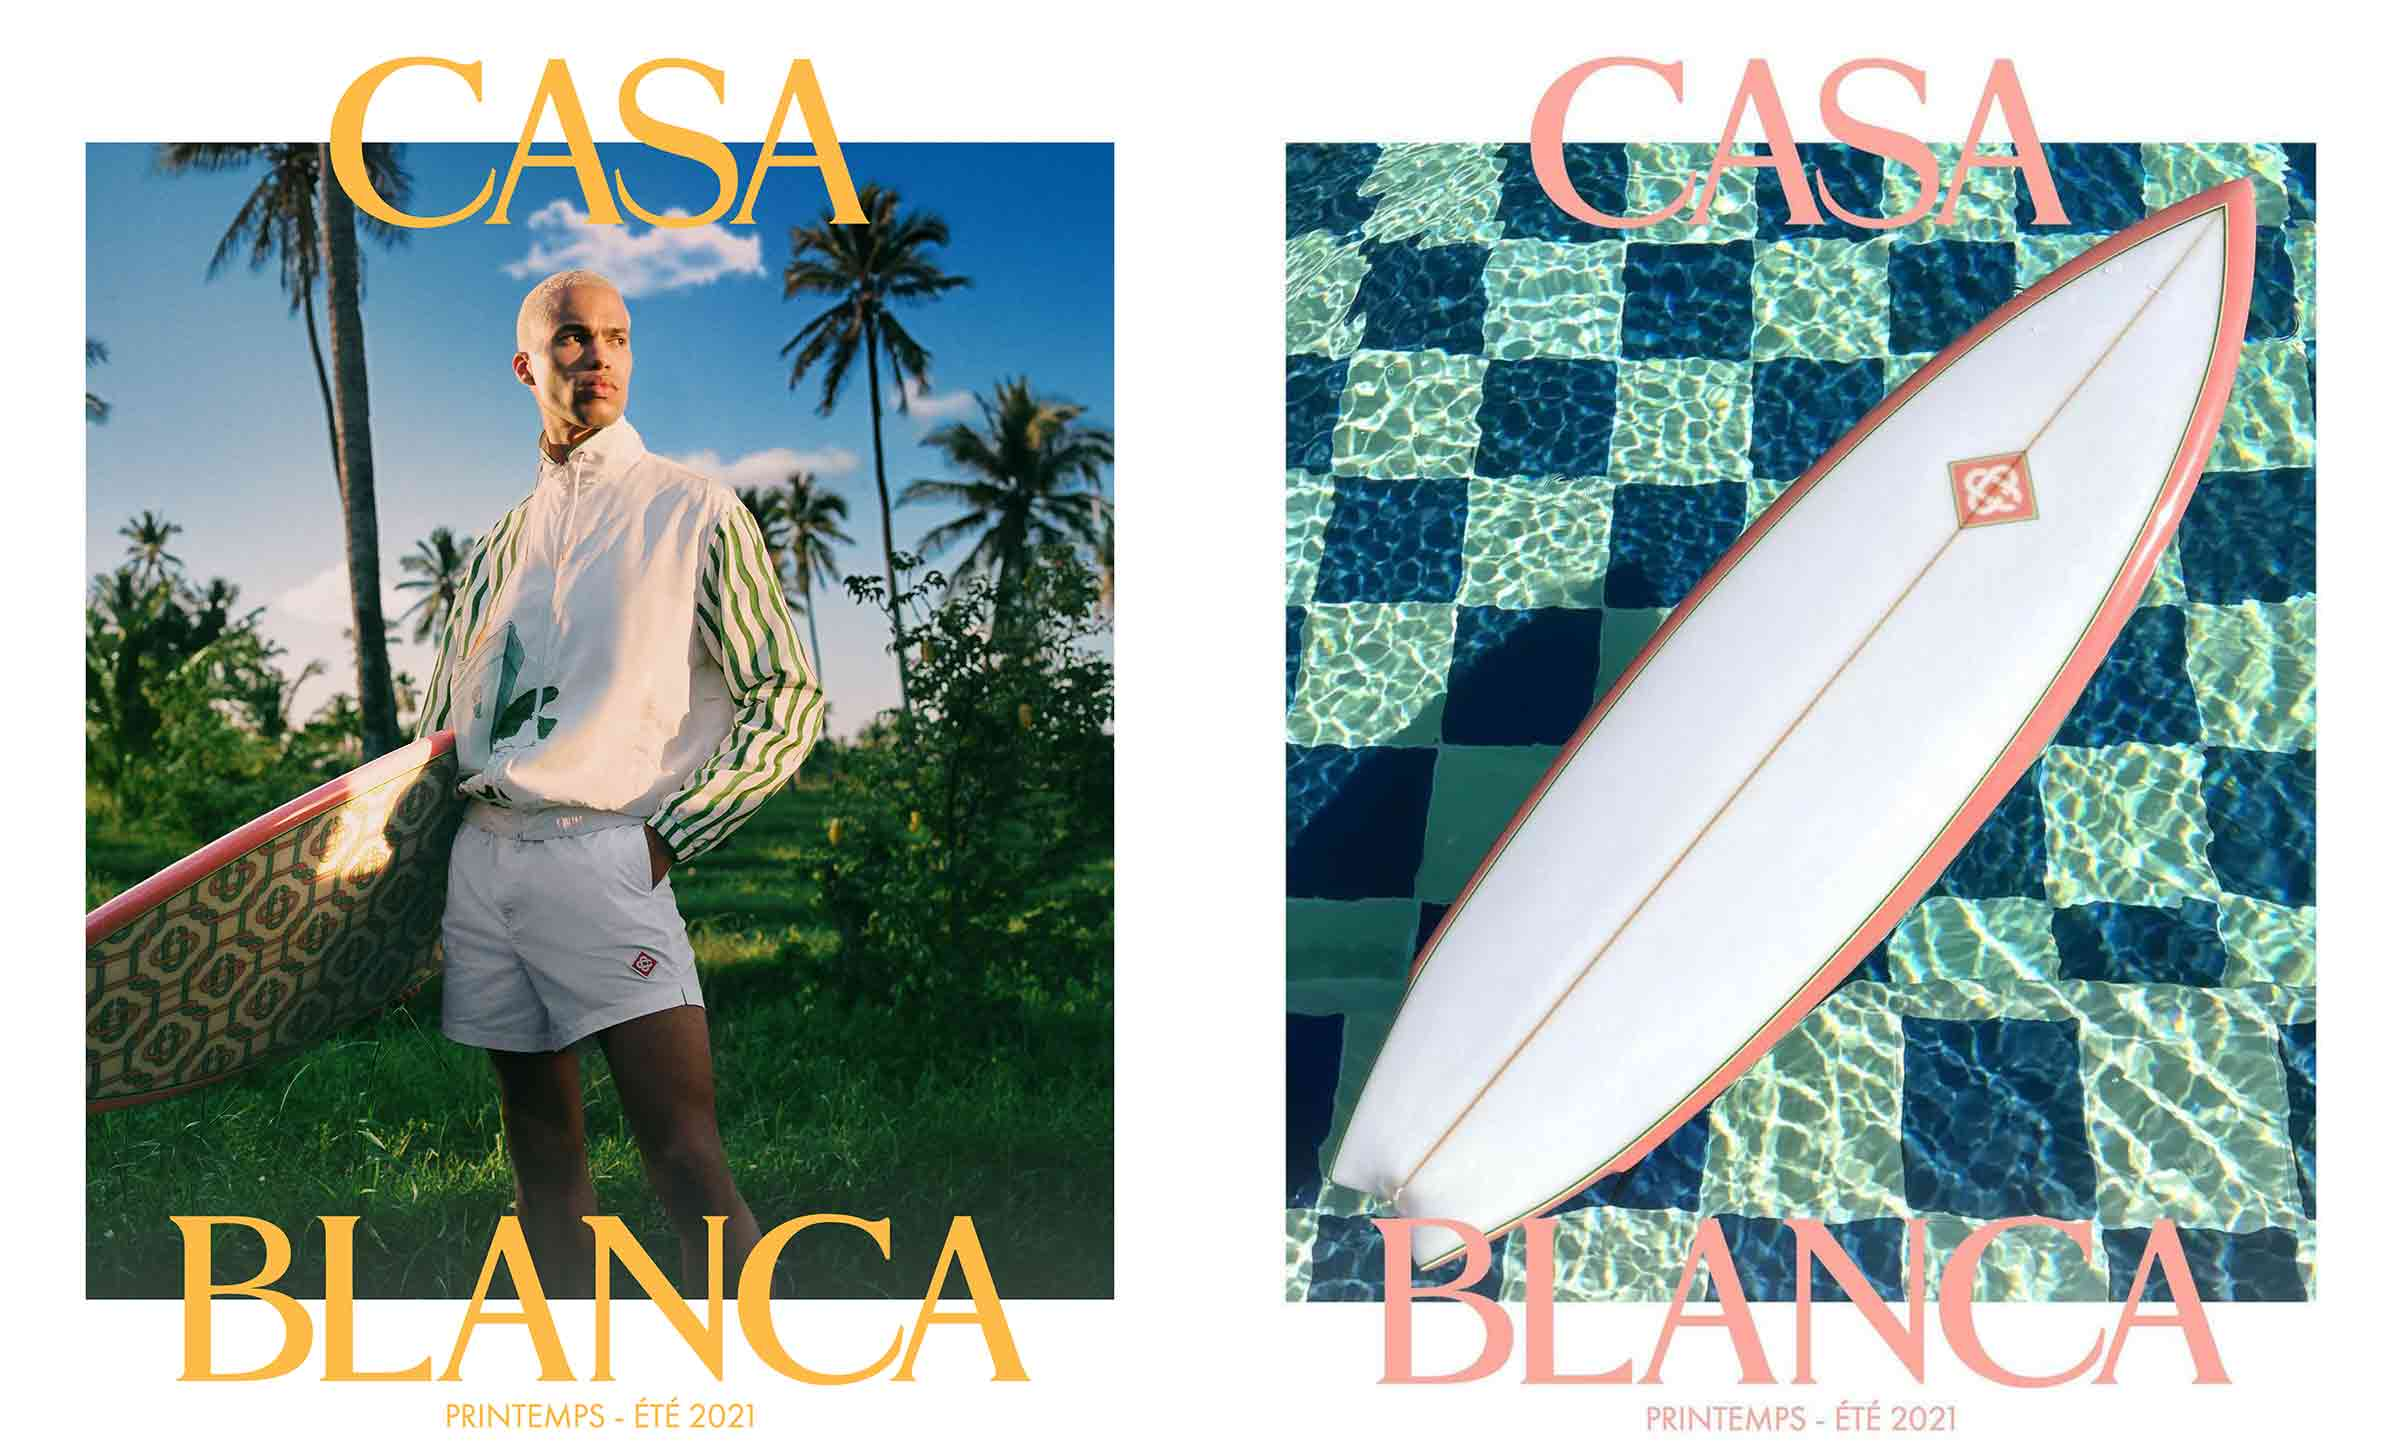 Casablanca 推出 2021 春夏季冲浪板单品